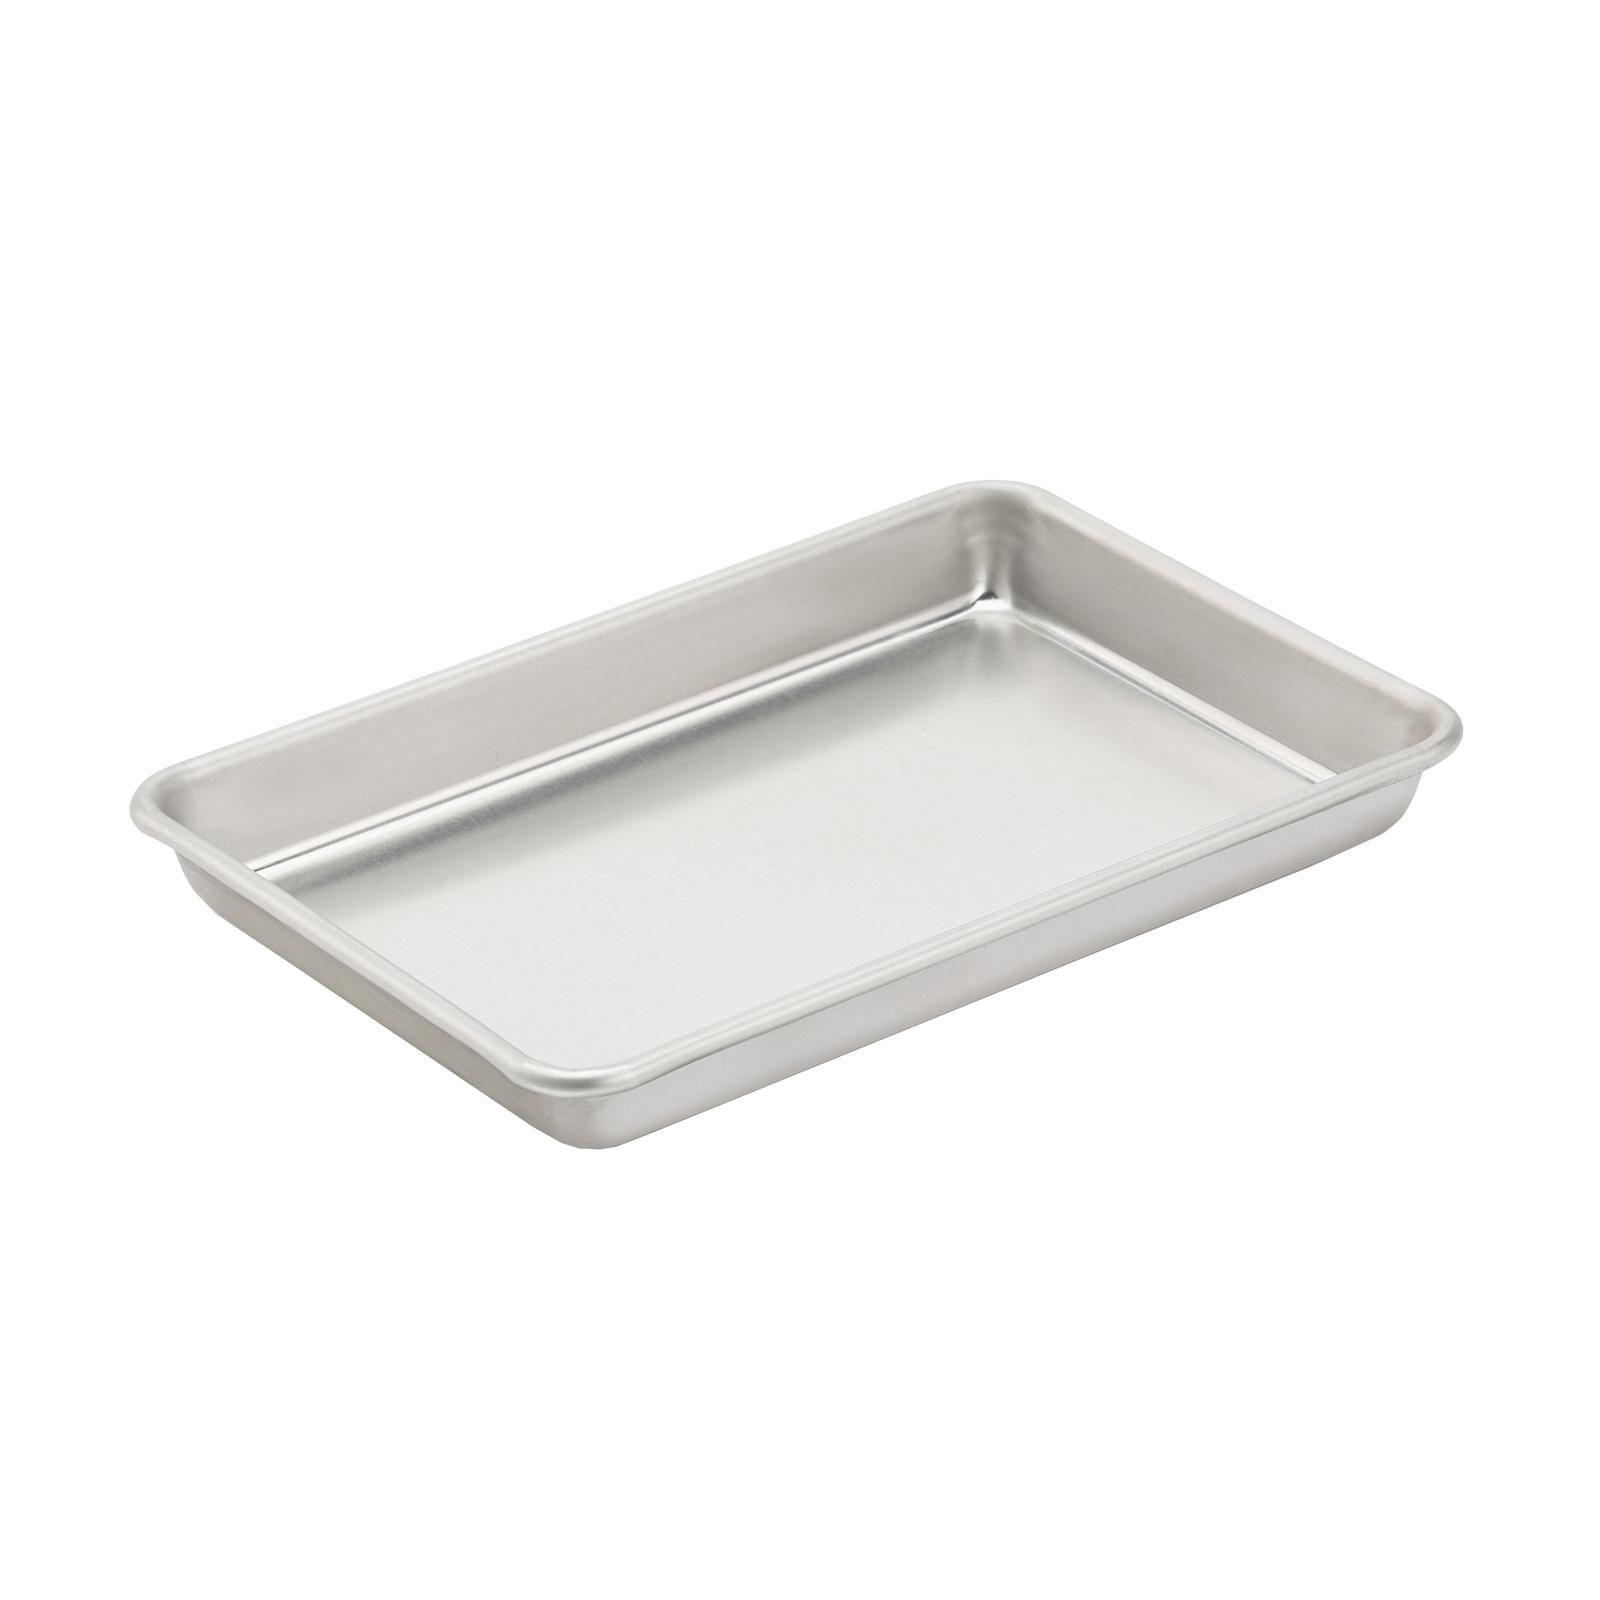 Vollrath 5228 bun / sheet pan